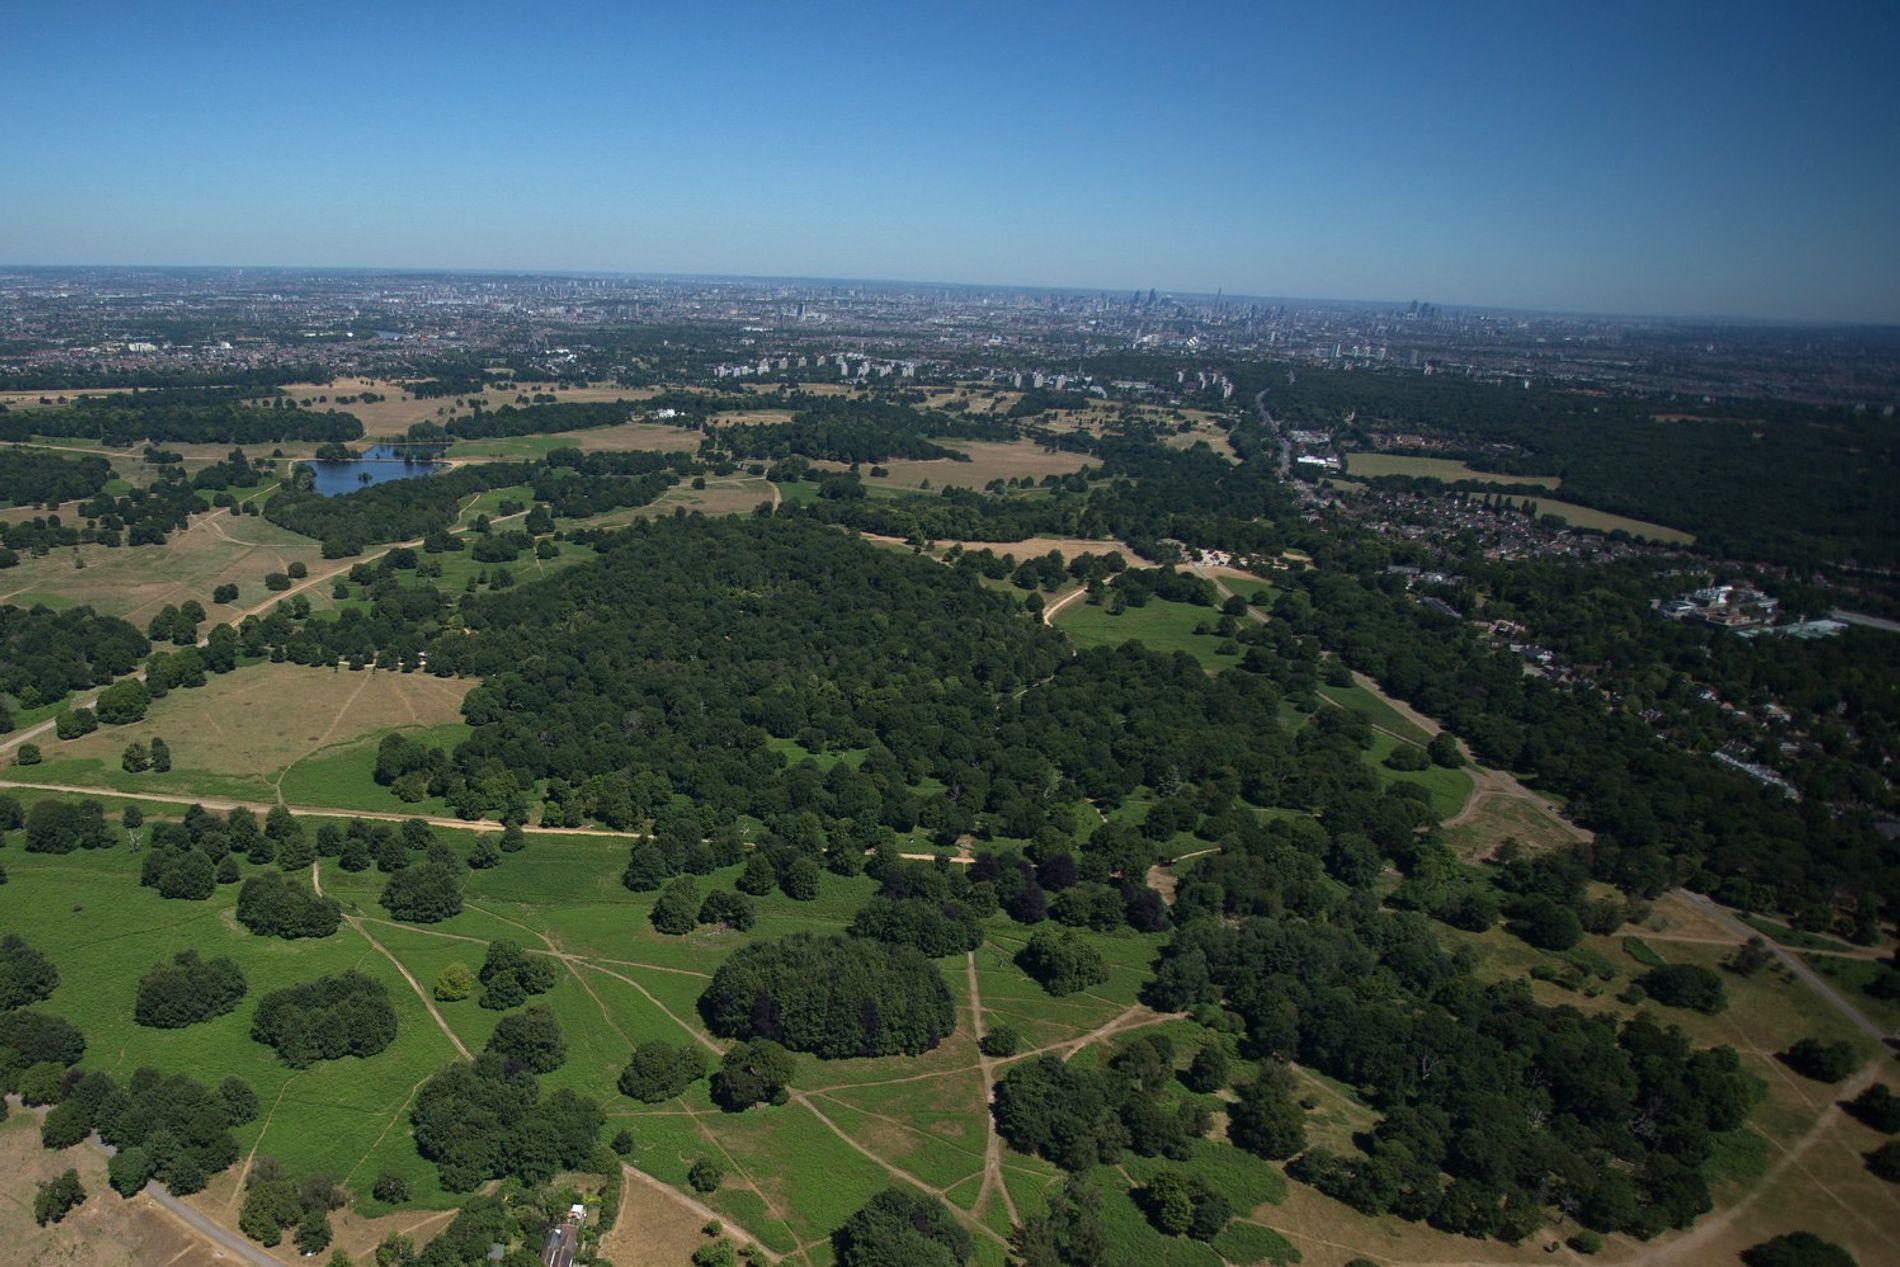 London National Park City